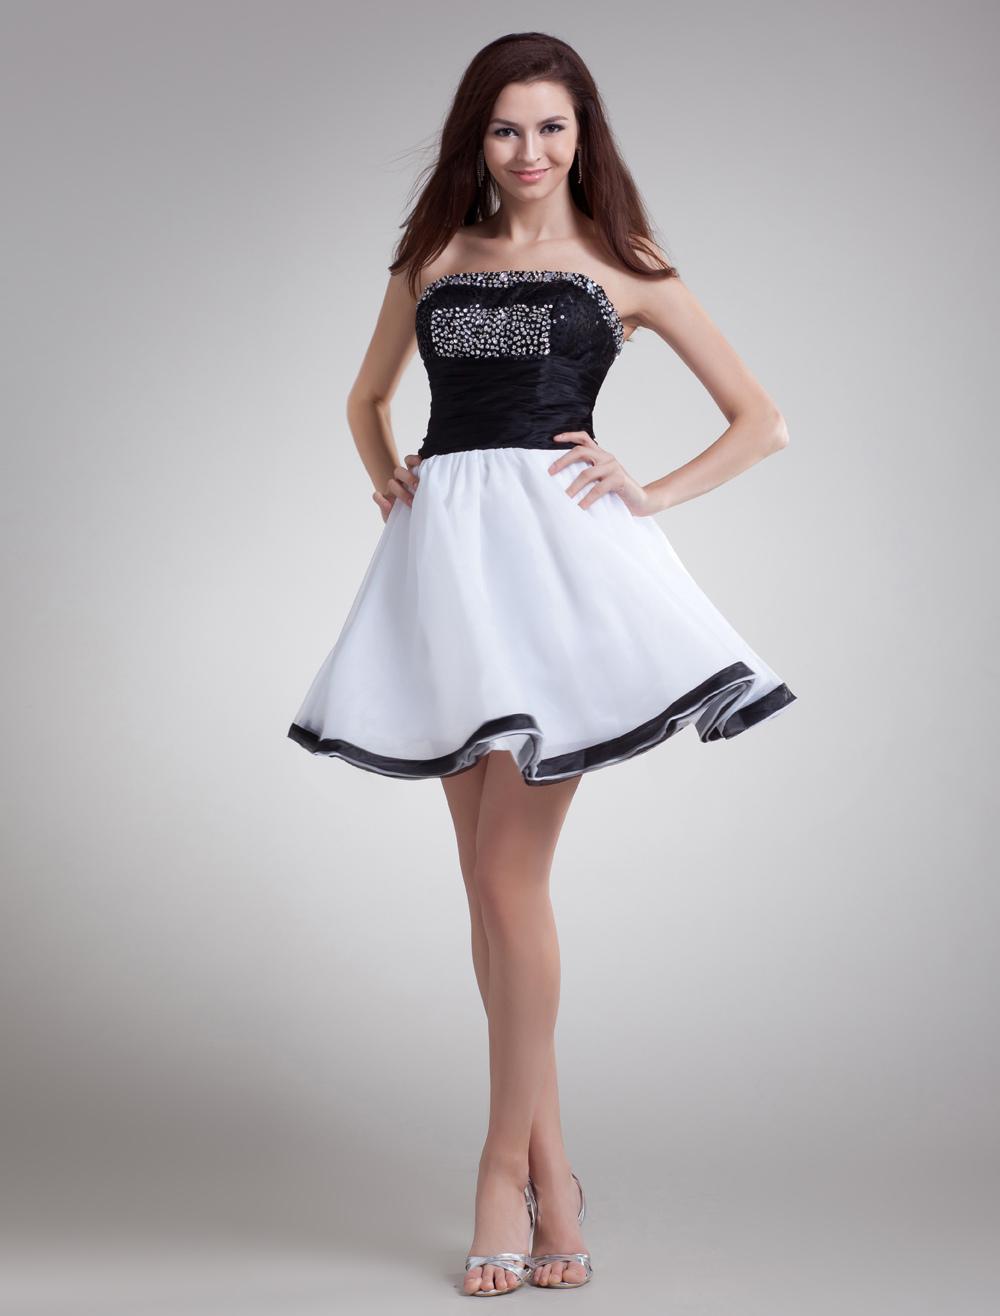 Black Sequin Strapless Organza Short Fashion Cocktail Dress (Wedding Cheap Party Dress) photo